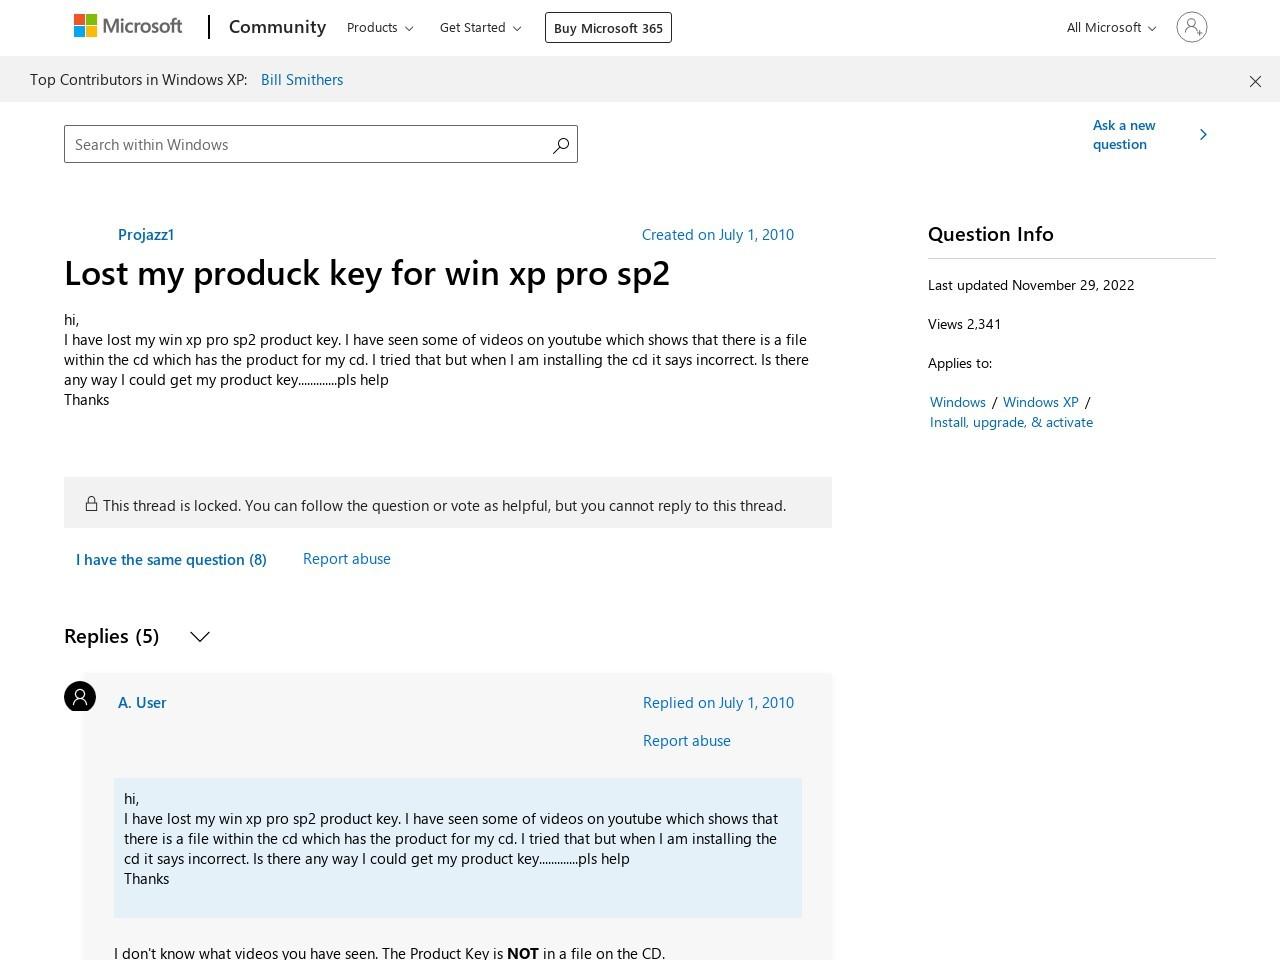 Lost my produck key for win xp pro sp2 - Microsoft Community